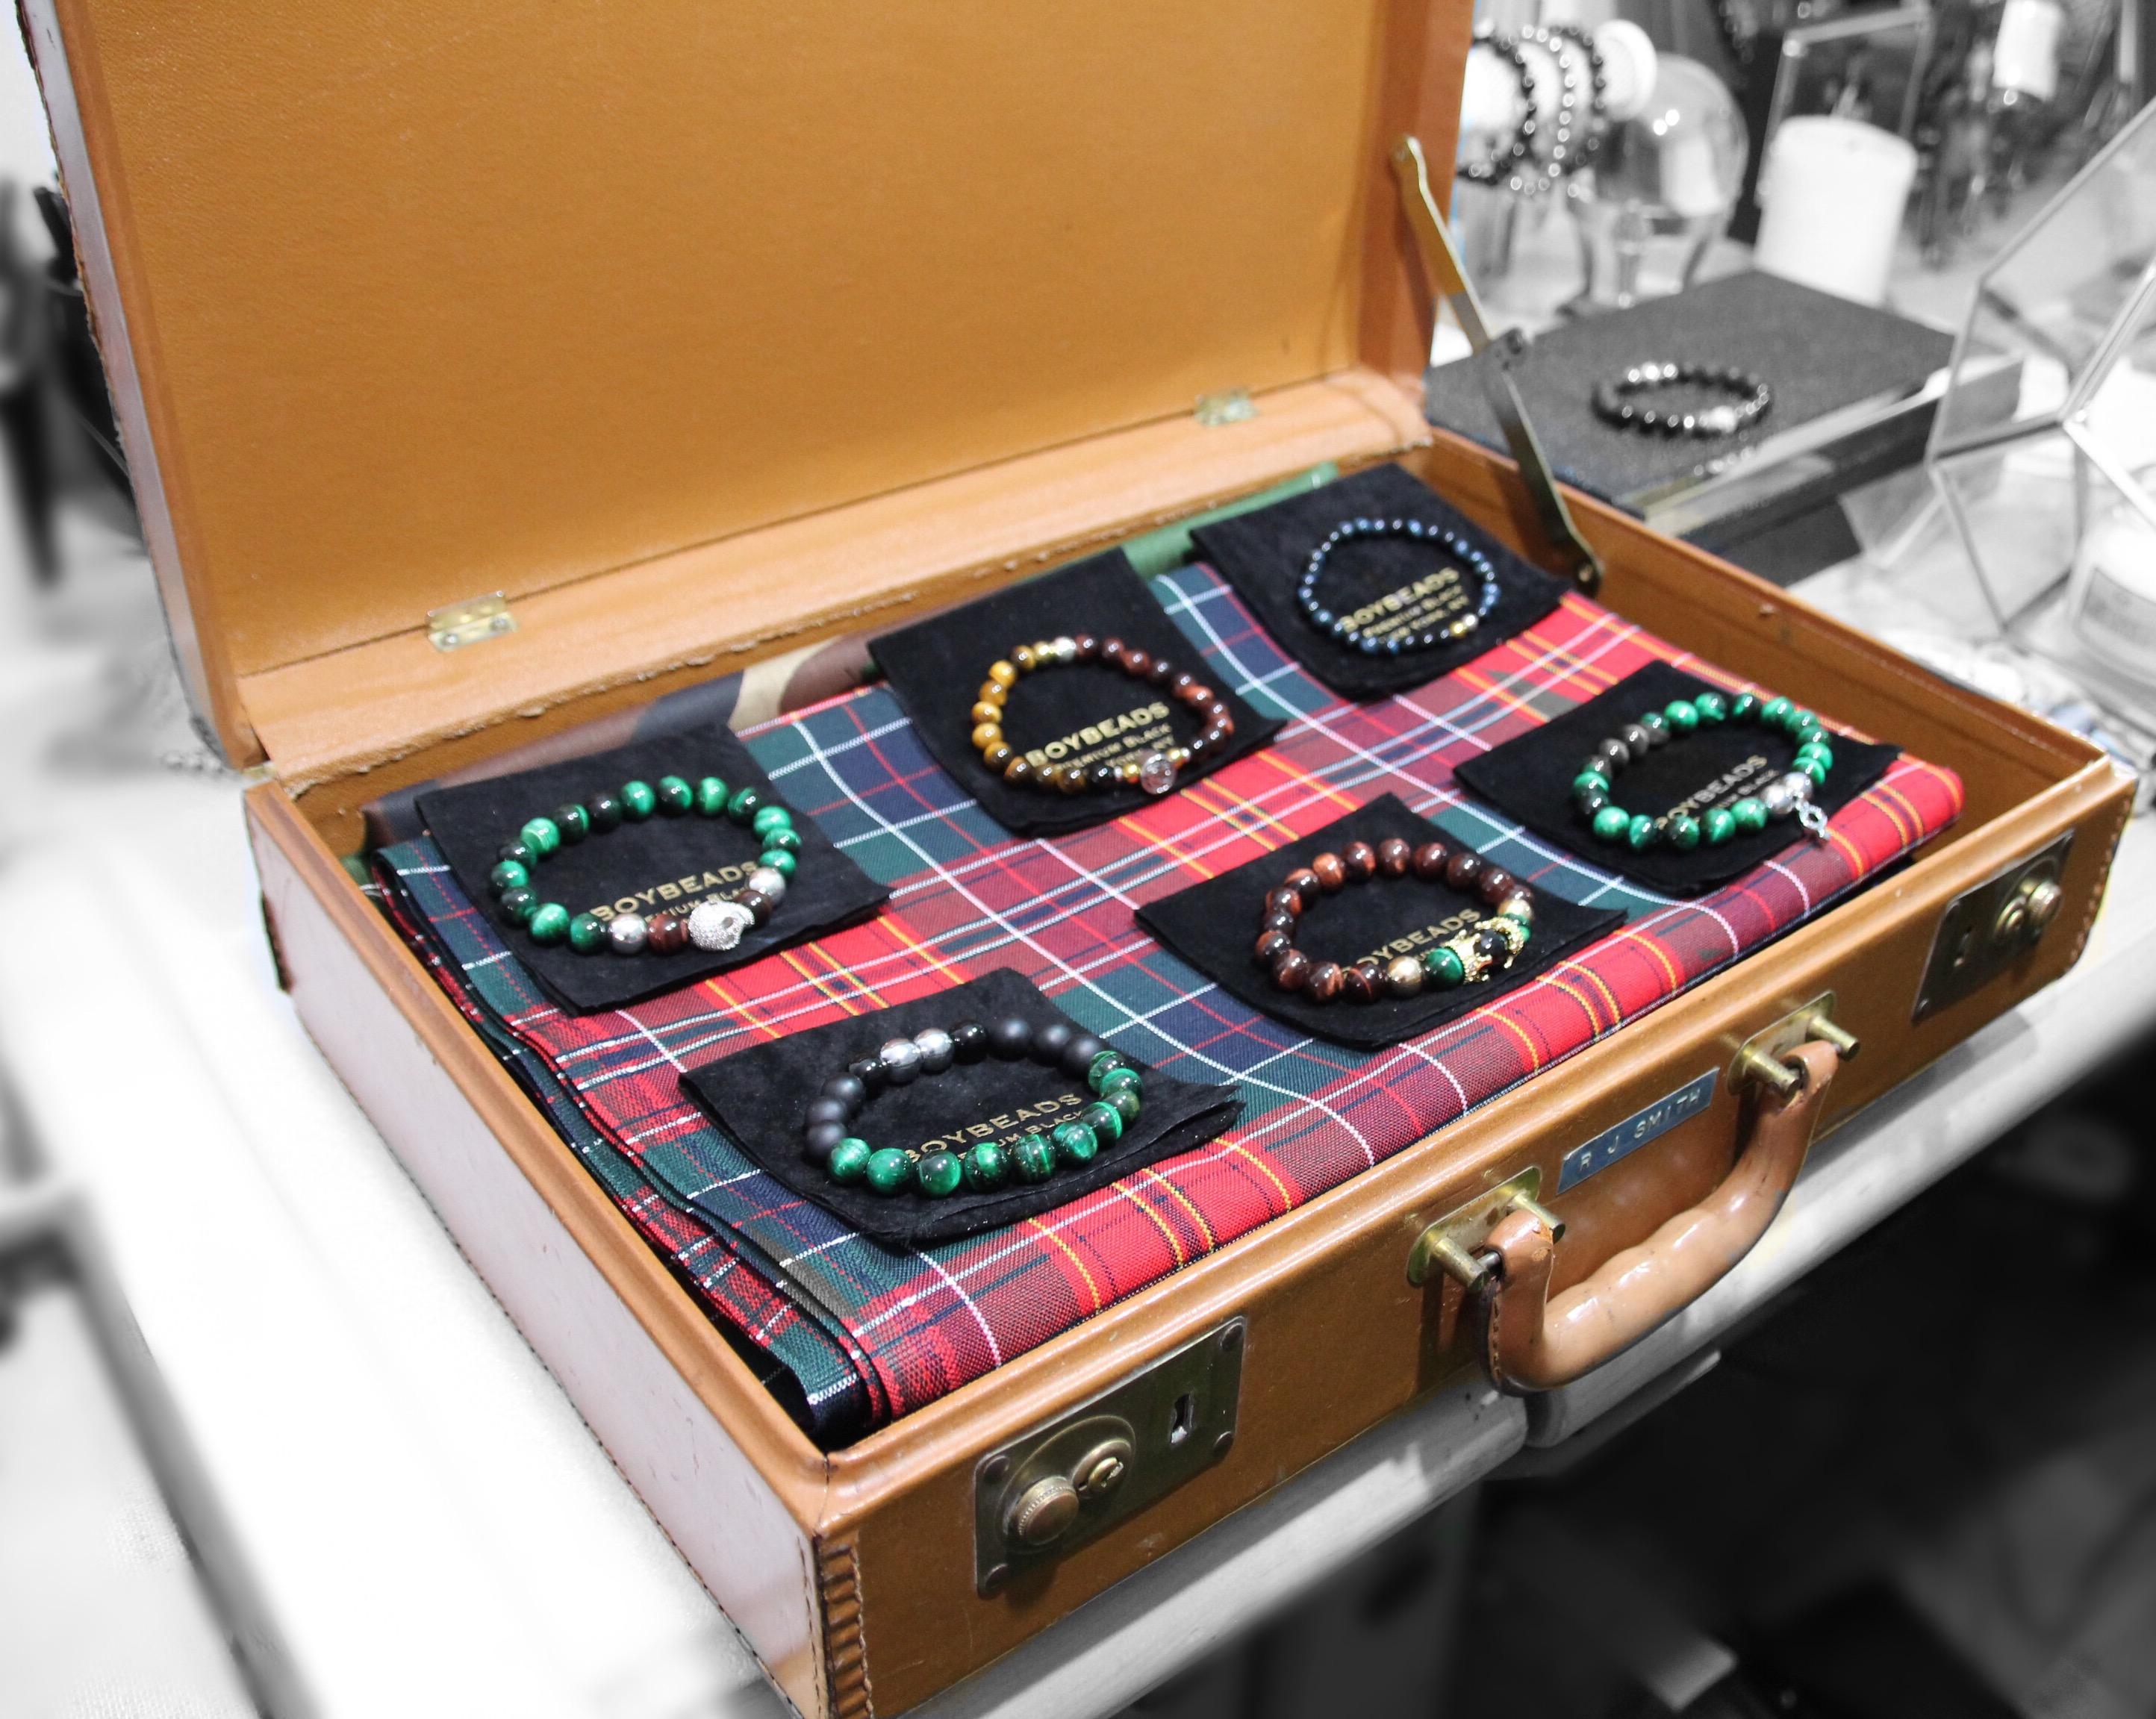 boybeads-trunk-show-vintage-jewelry-beaded-bracelets-handmade-trunk-luggage-display-etsy-harlem-vintage-antiques-nyctartan-plain-holiday-setup.jpg